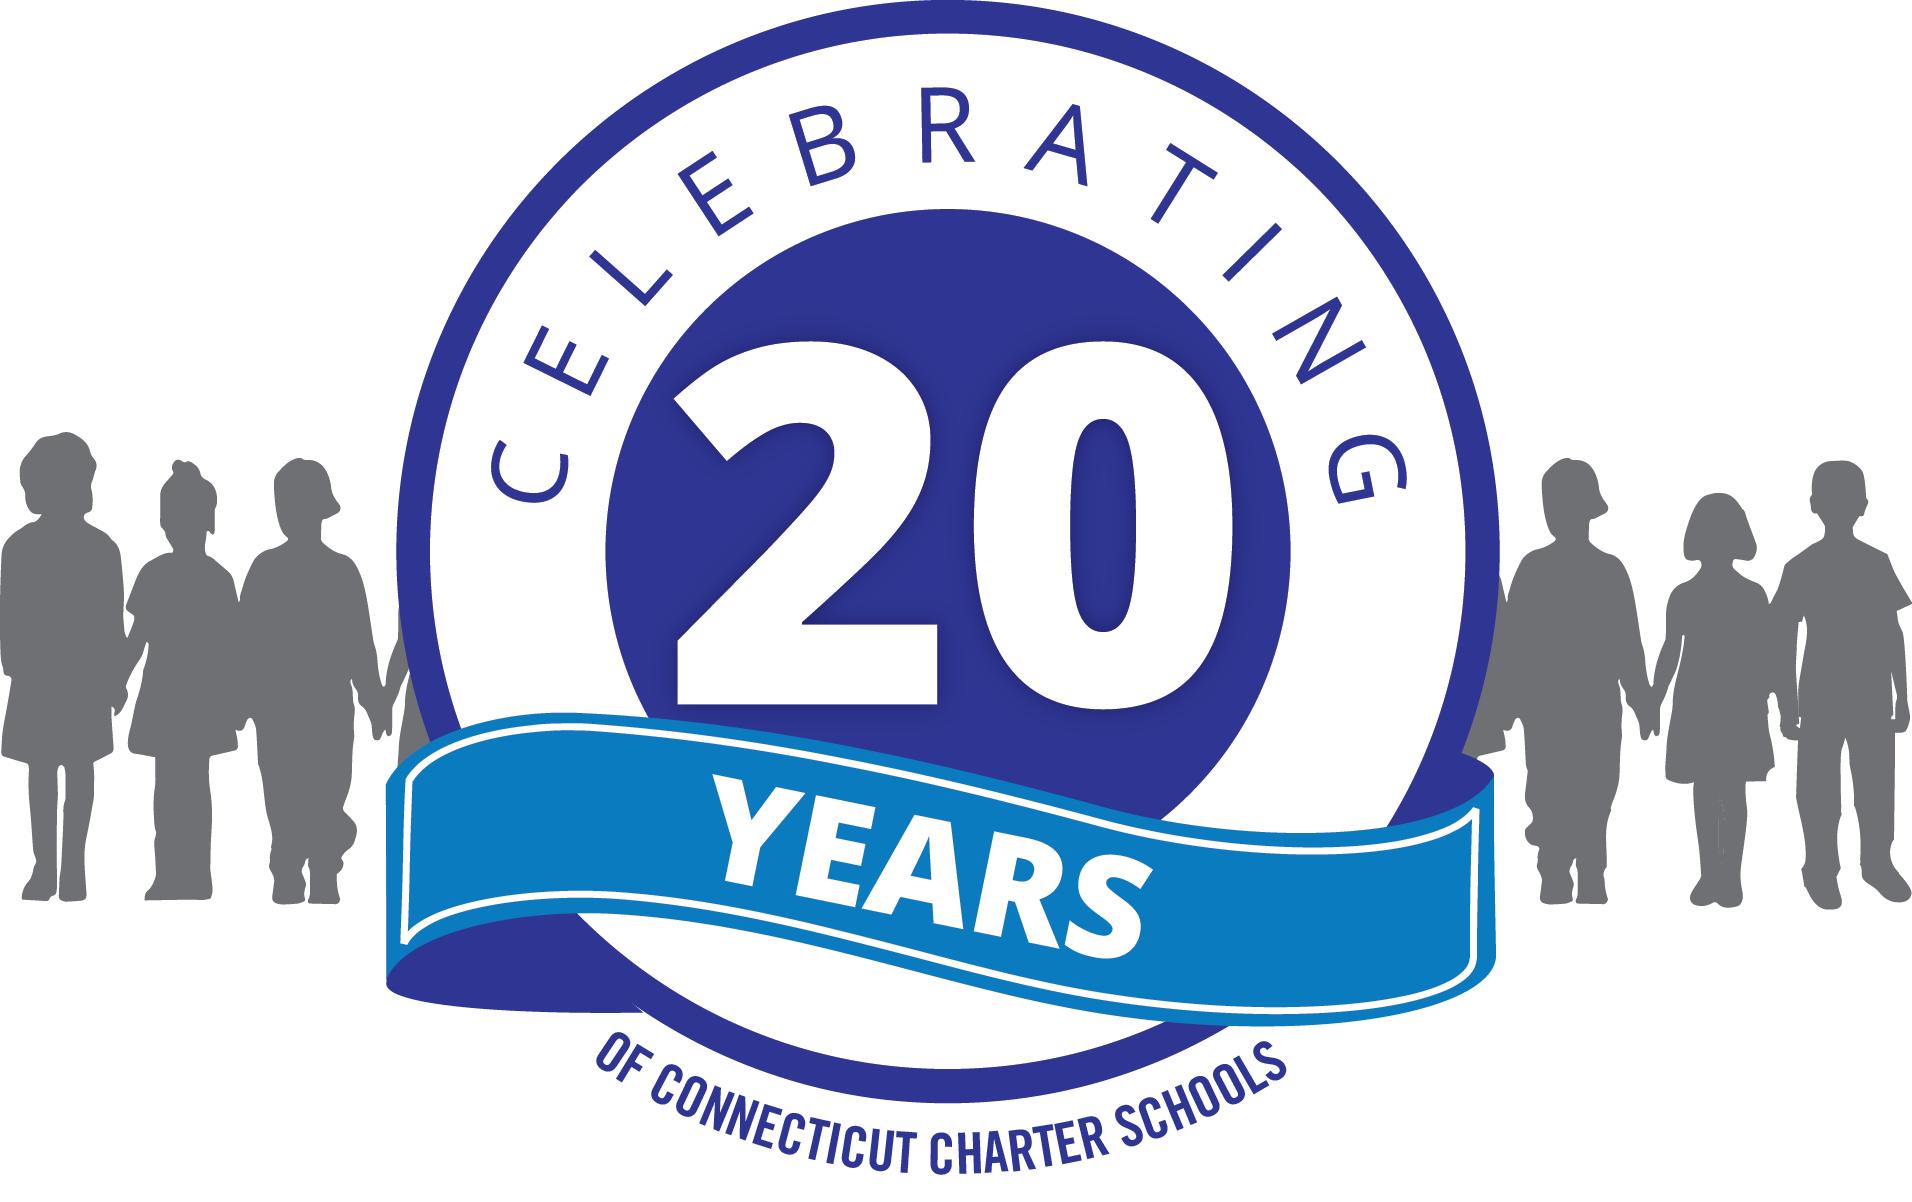 NECSN_20th_Anniversary_Logo_final_(1).png